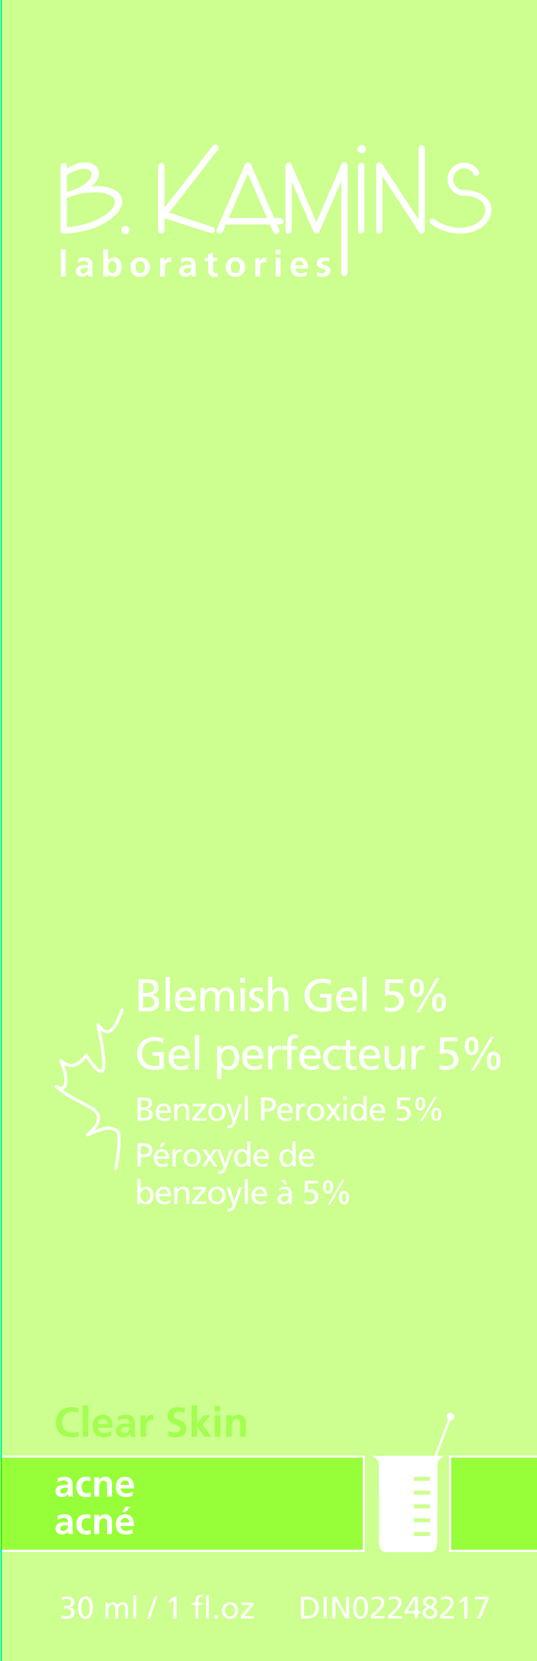 Blemish (Benzoyl Peroxide) Gel [Kamins Dermatologics Inc.]